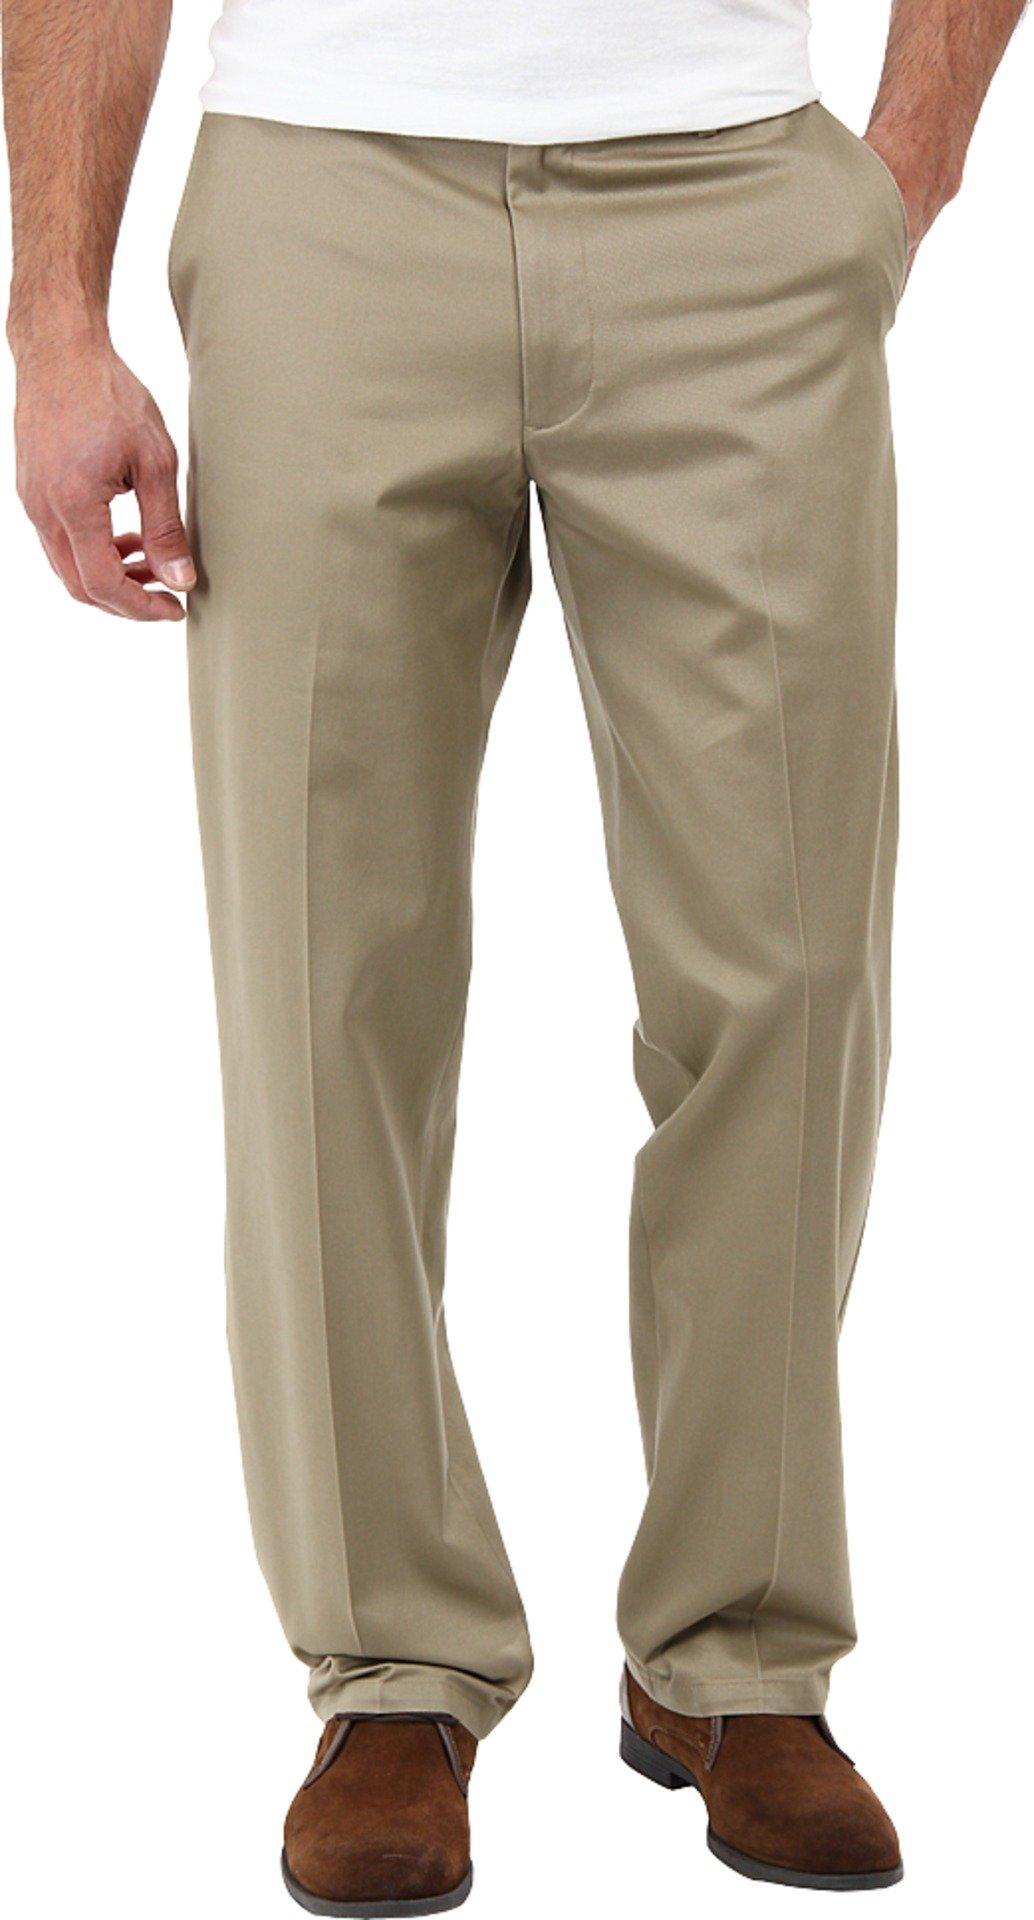 Dockers Men's Men's Signature Khaki D2 Straight Fit Flat Front British Khaki Pants 32 X 34